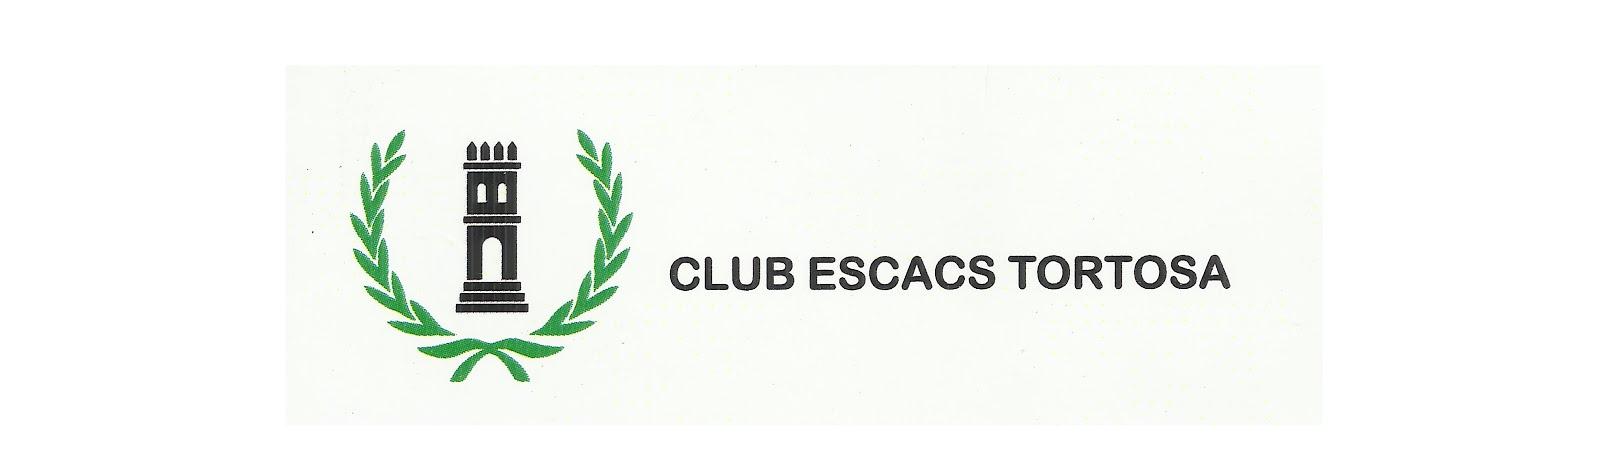 Logo Club Escacs Tortosa